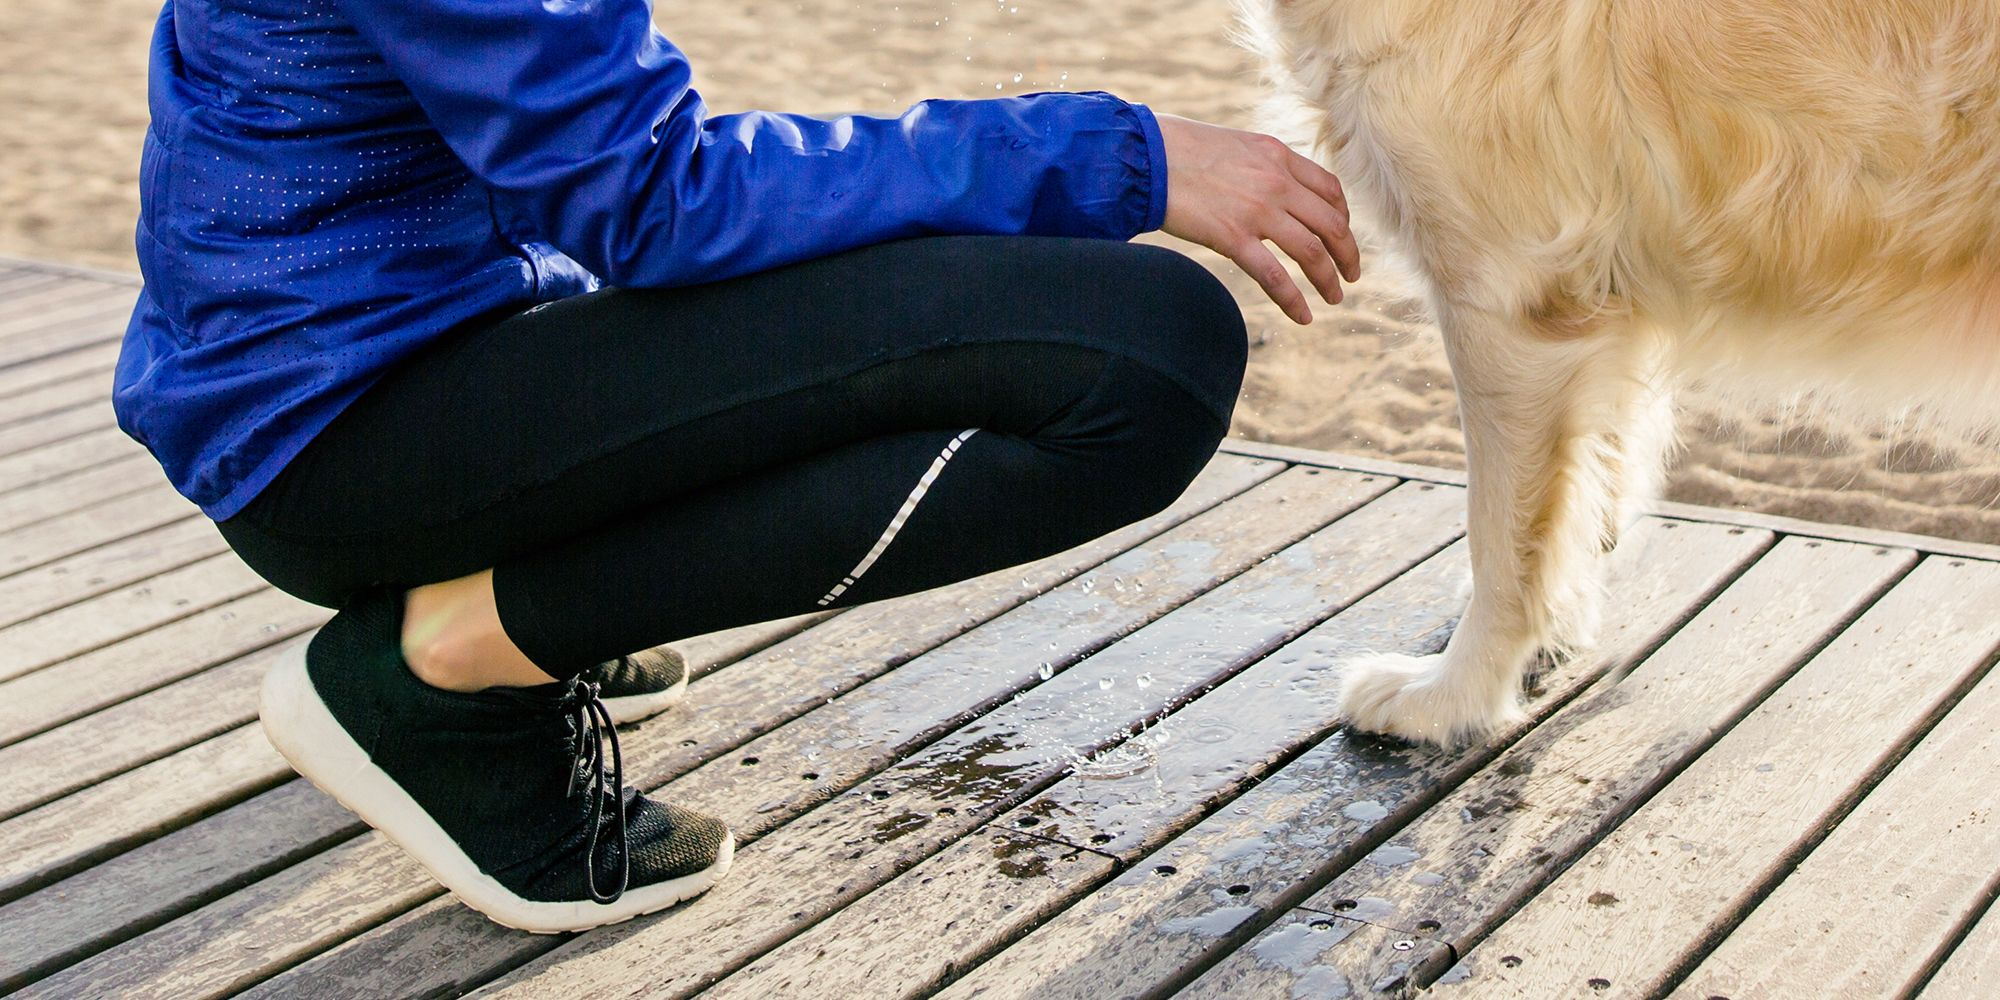 20 Best Women's Walking Shoes 2019 Most Comfortable